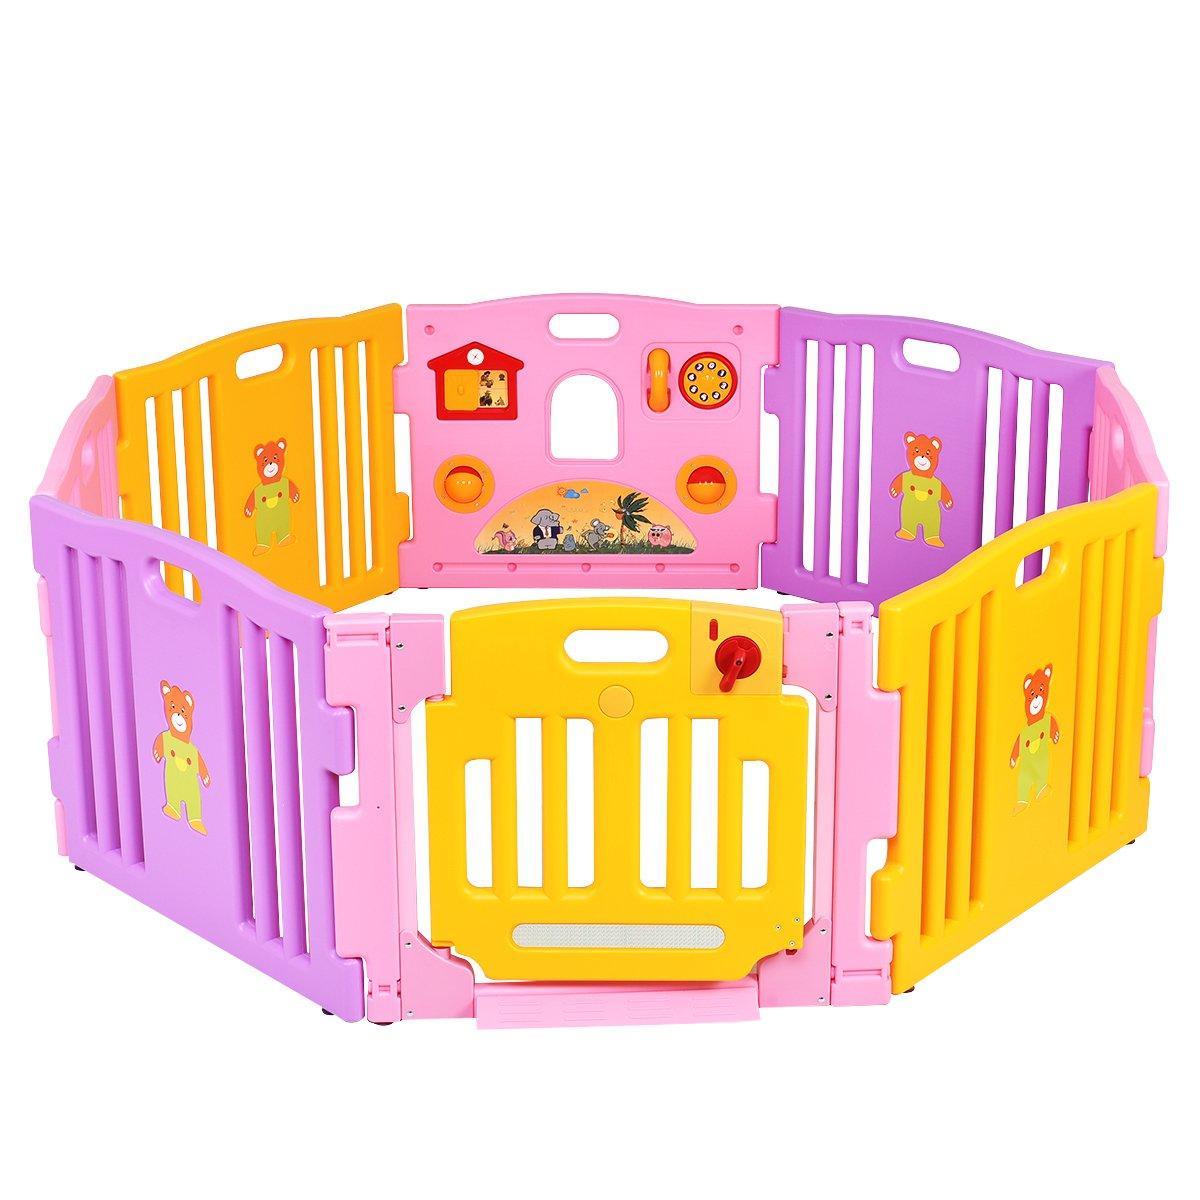 Costway 8 Panel Baby Playpen Large Kids Activity Center Room Divider Toy Pink Indoor (Playpen Only)